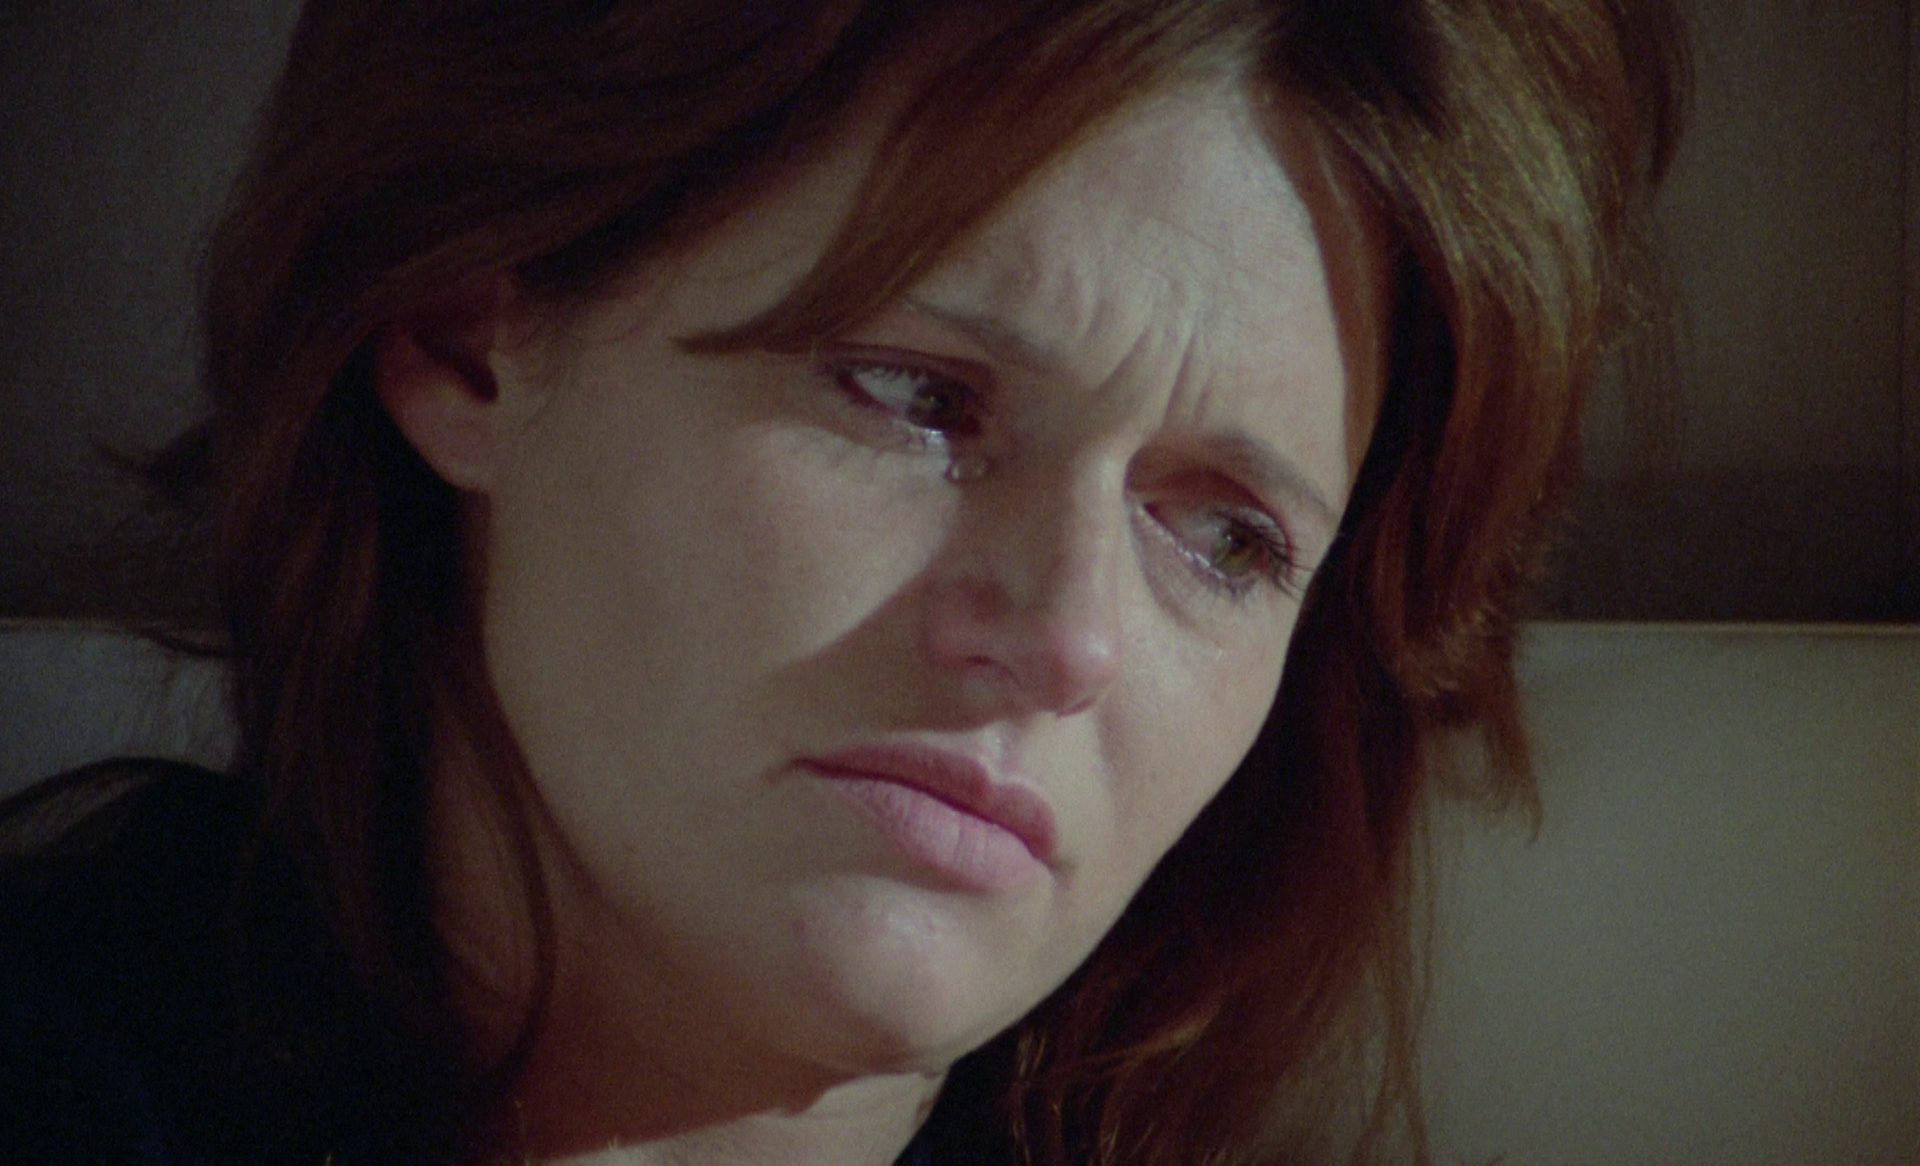 Szene aus 'Made(1972)', Copyright: Janet Productions, Studiocanal